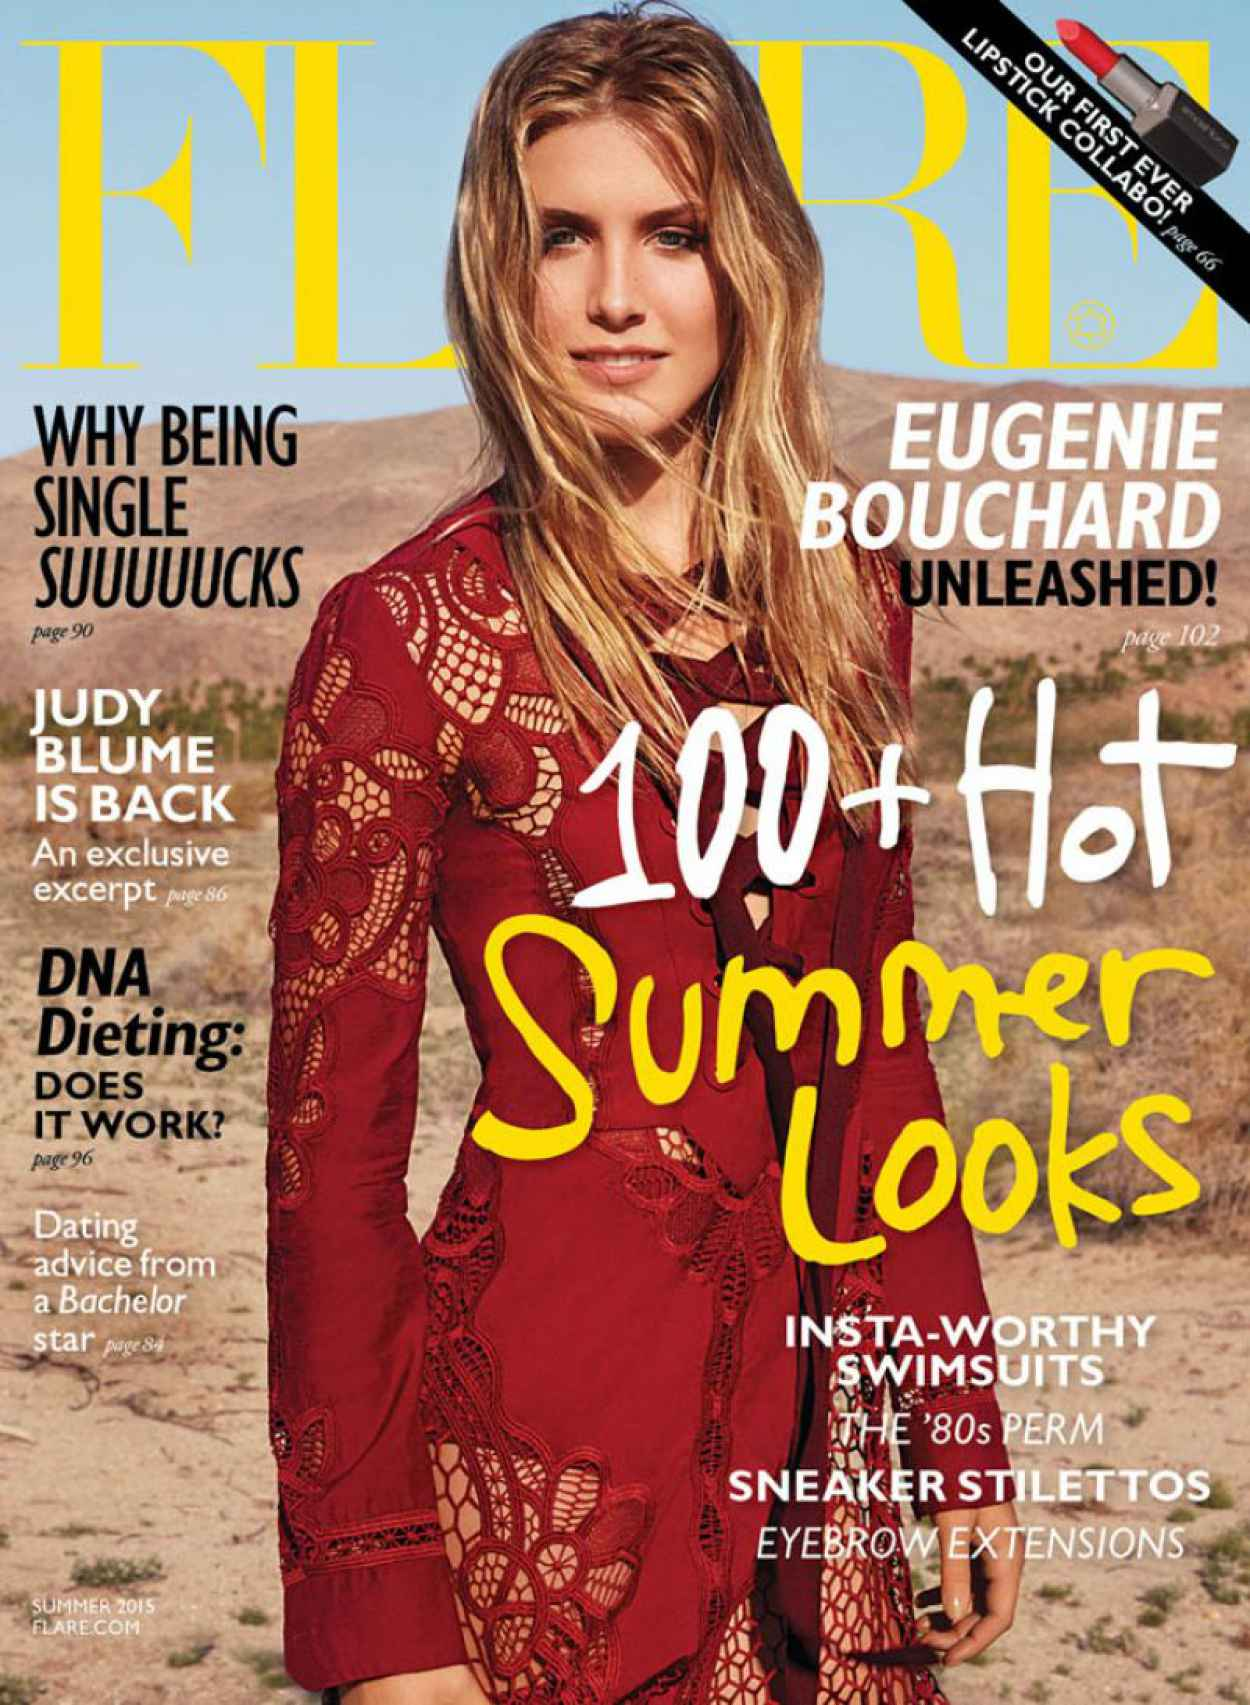 Eugenie Bouchard - Flare Magazine June 2015 Issue-4